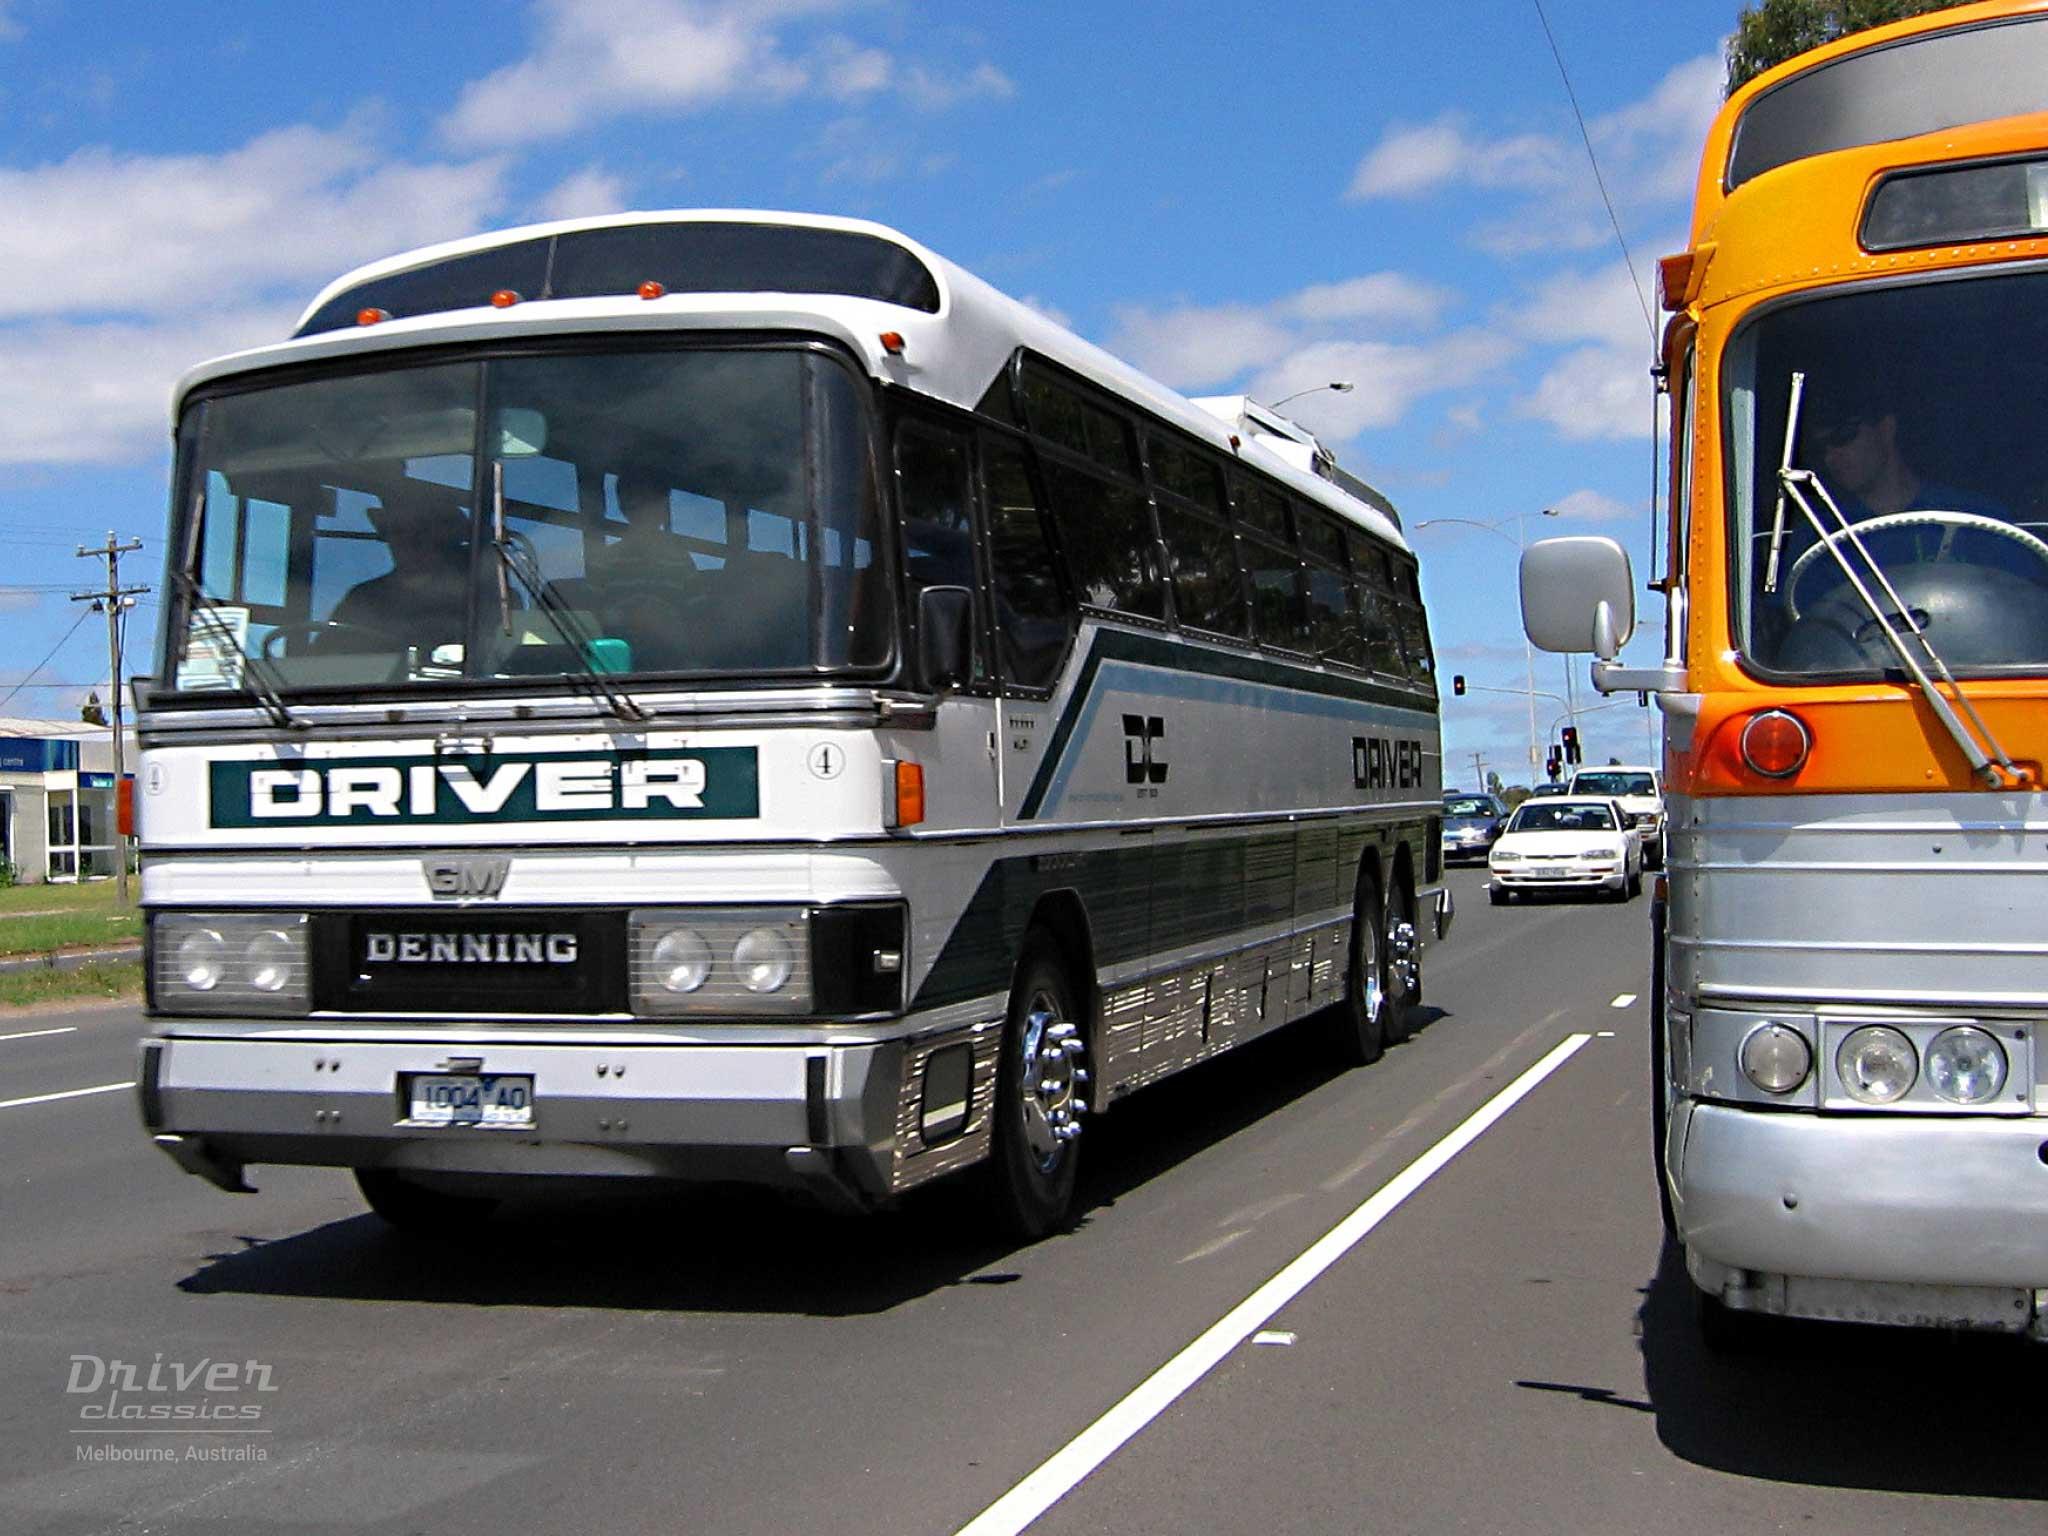 1983 GM Denning DenAir Mono bus driving next to GMC PD 4107 bus